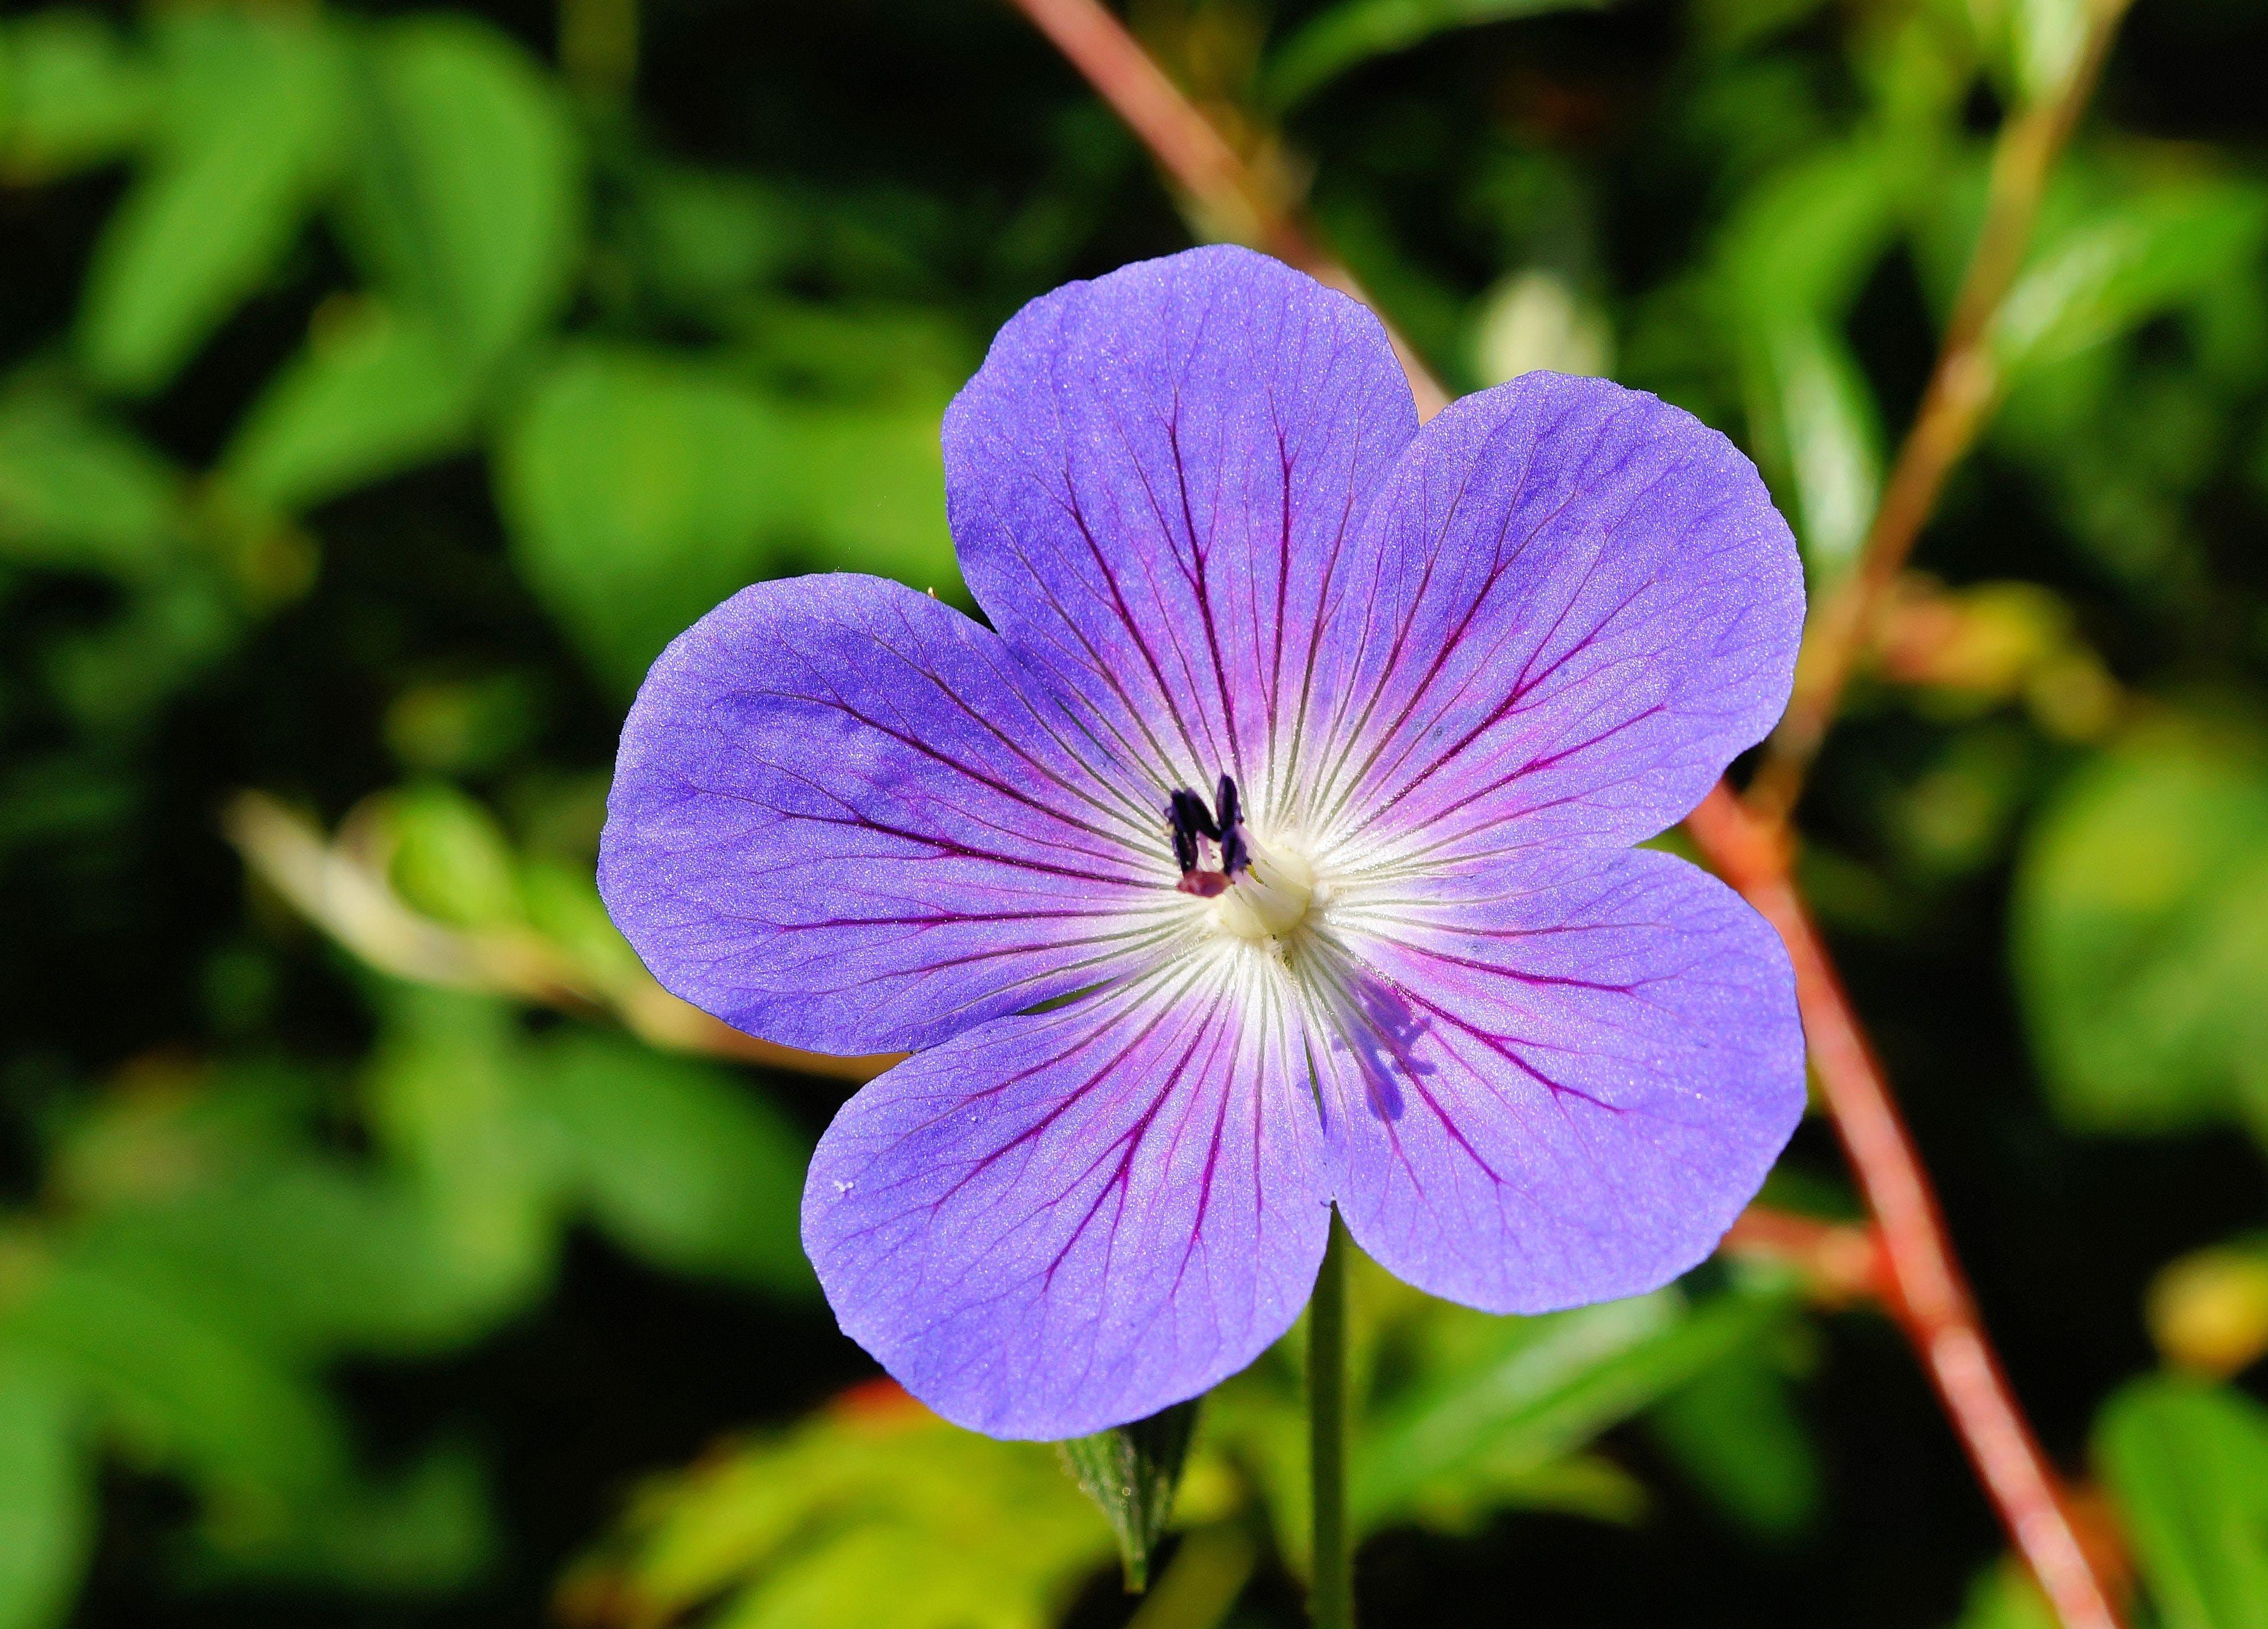 Purple Flower Shallow Focus Photography